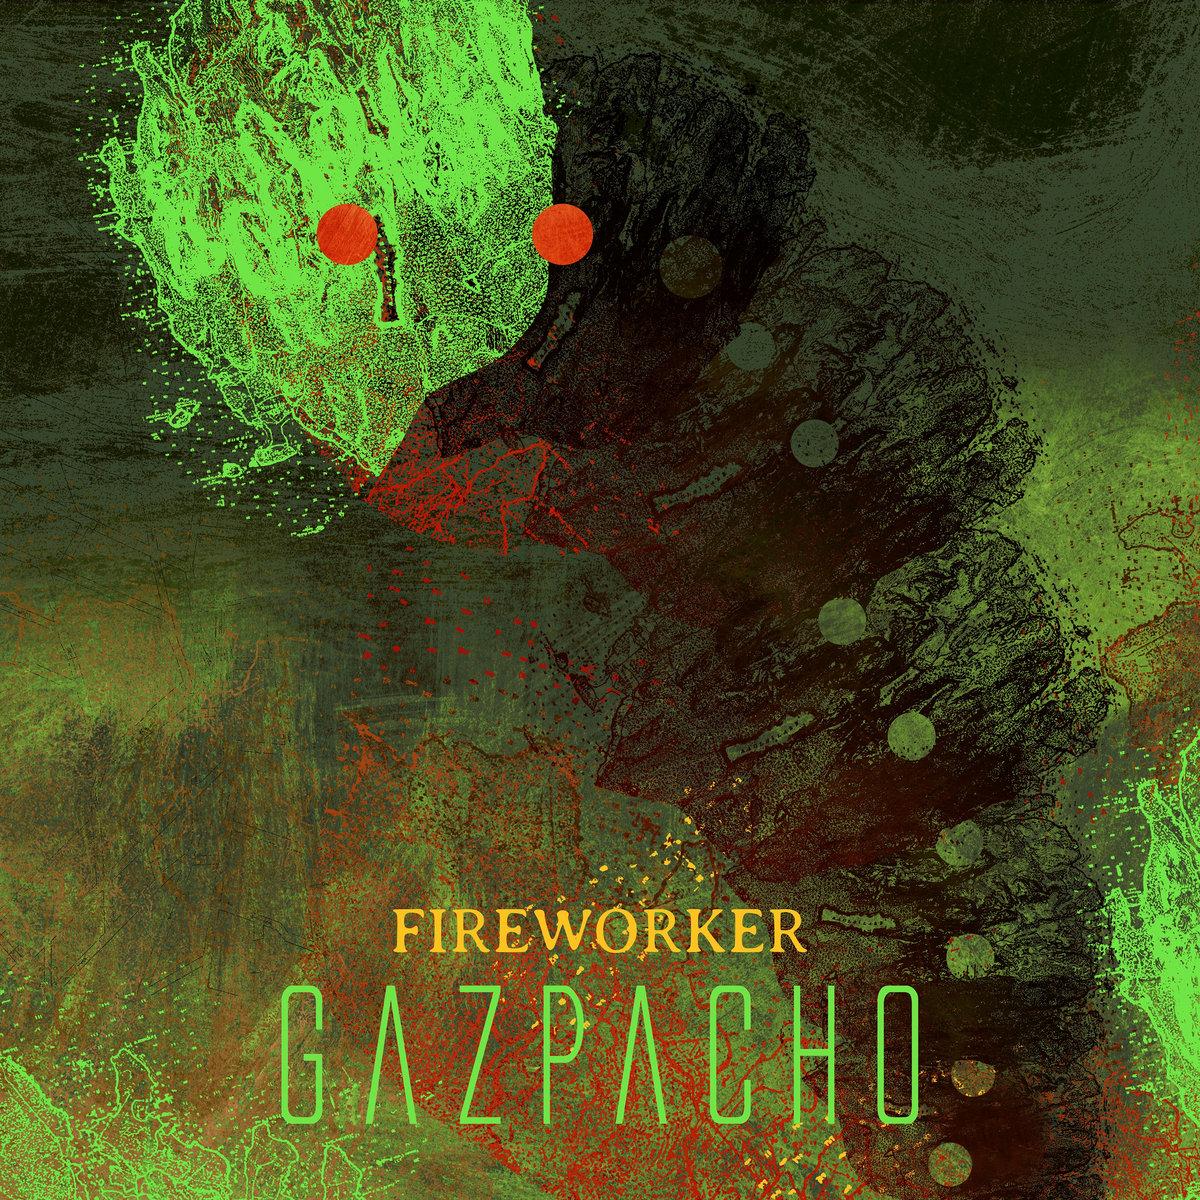 Gazpacho: Fireworker